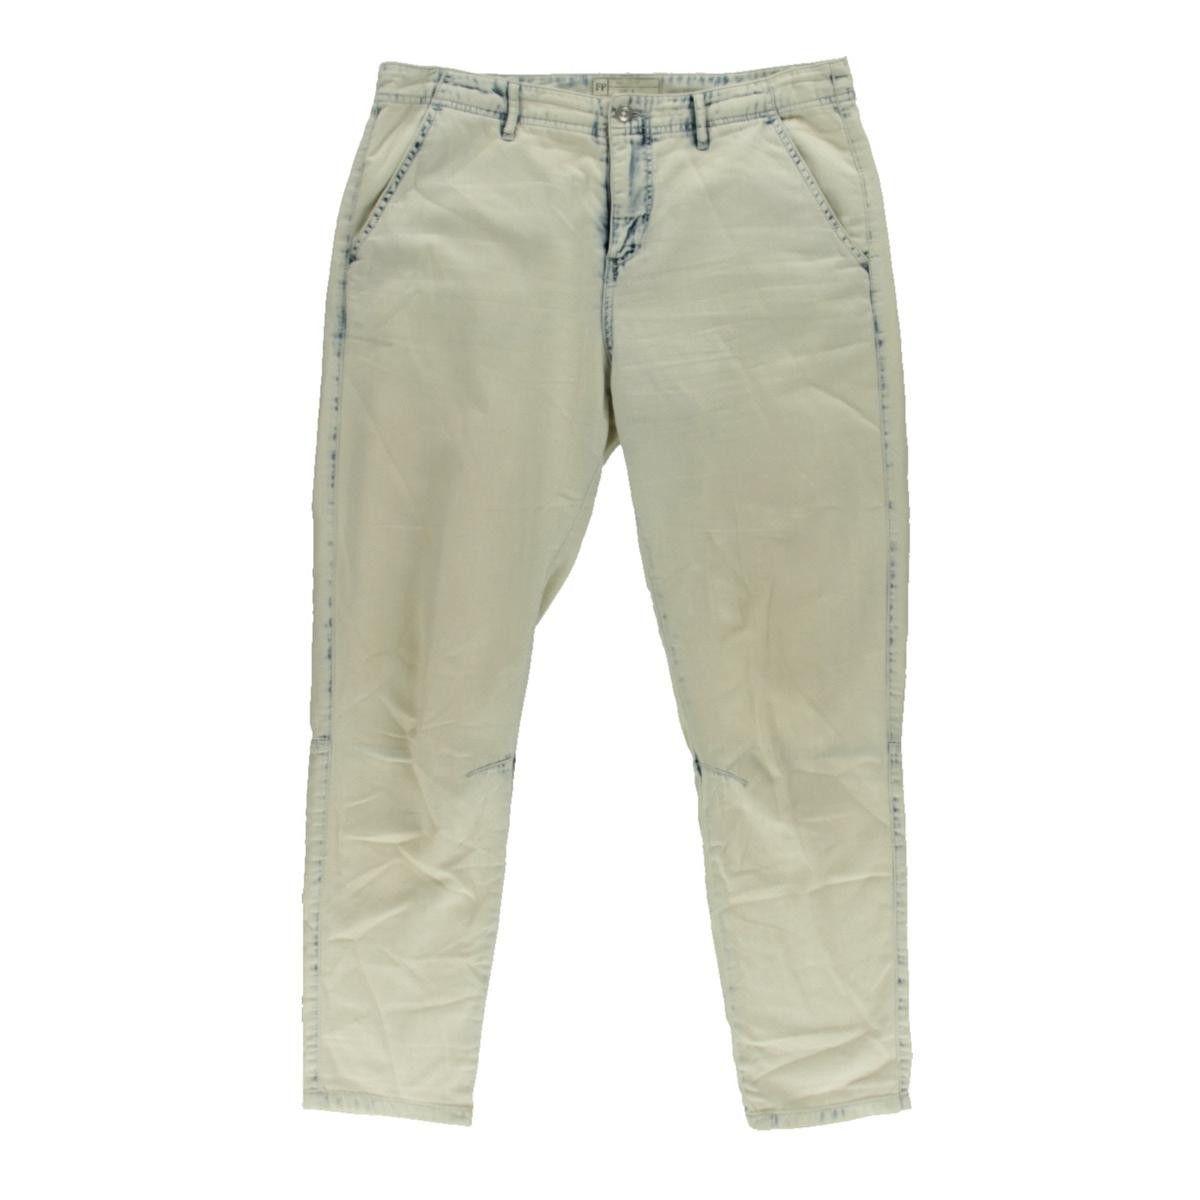 Free People Womens Chambray Denim Trouser Pants